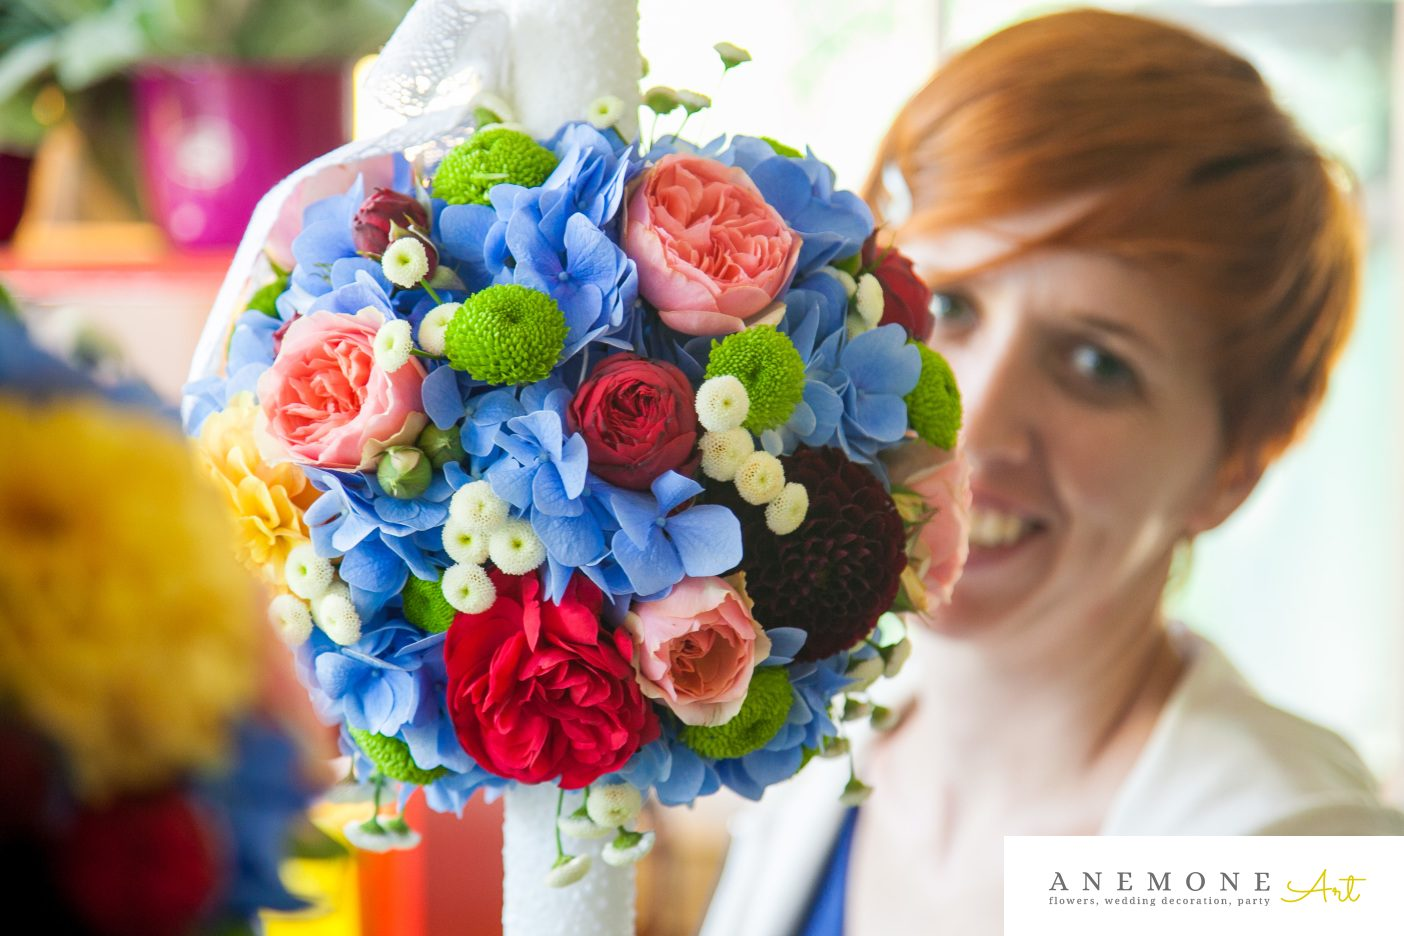 Poza, foto cu Flori de nunta lumanare cununie, multicolor in Arad, Timisoara, Oradea (wedding flowers, bouquets) nunta Arad, Timisoara, Oradea